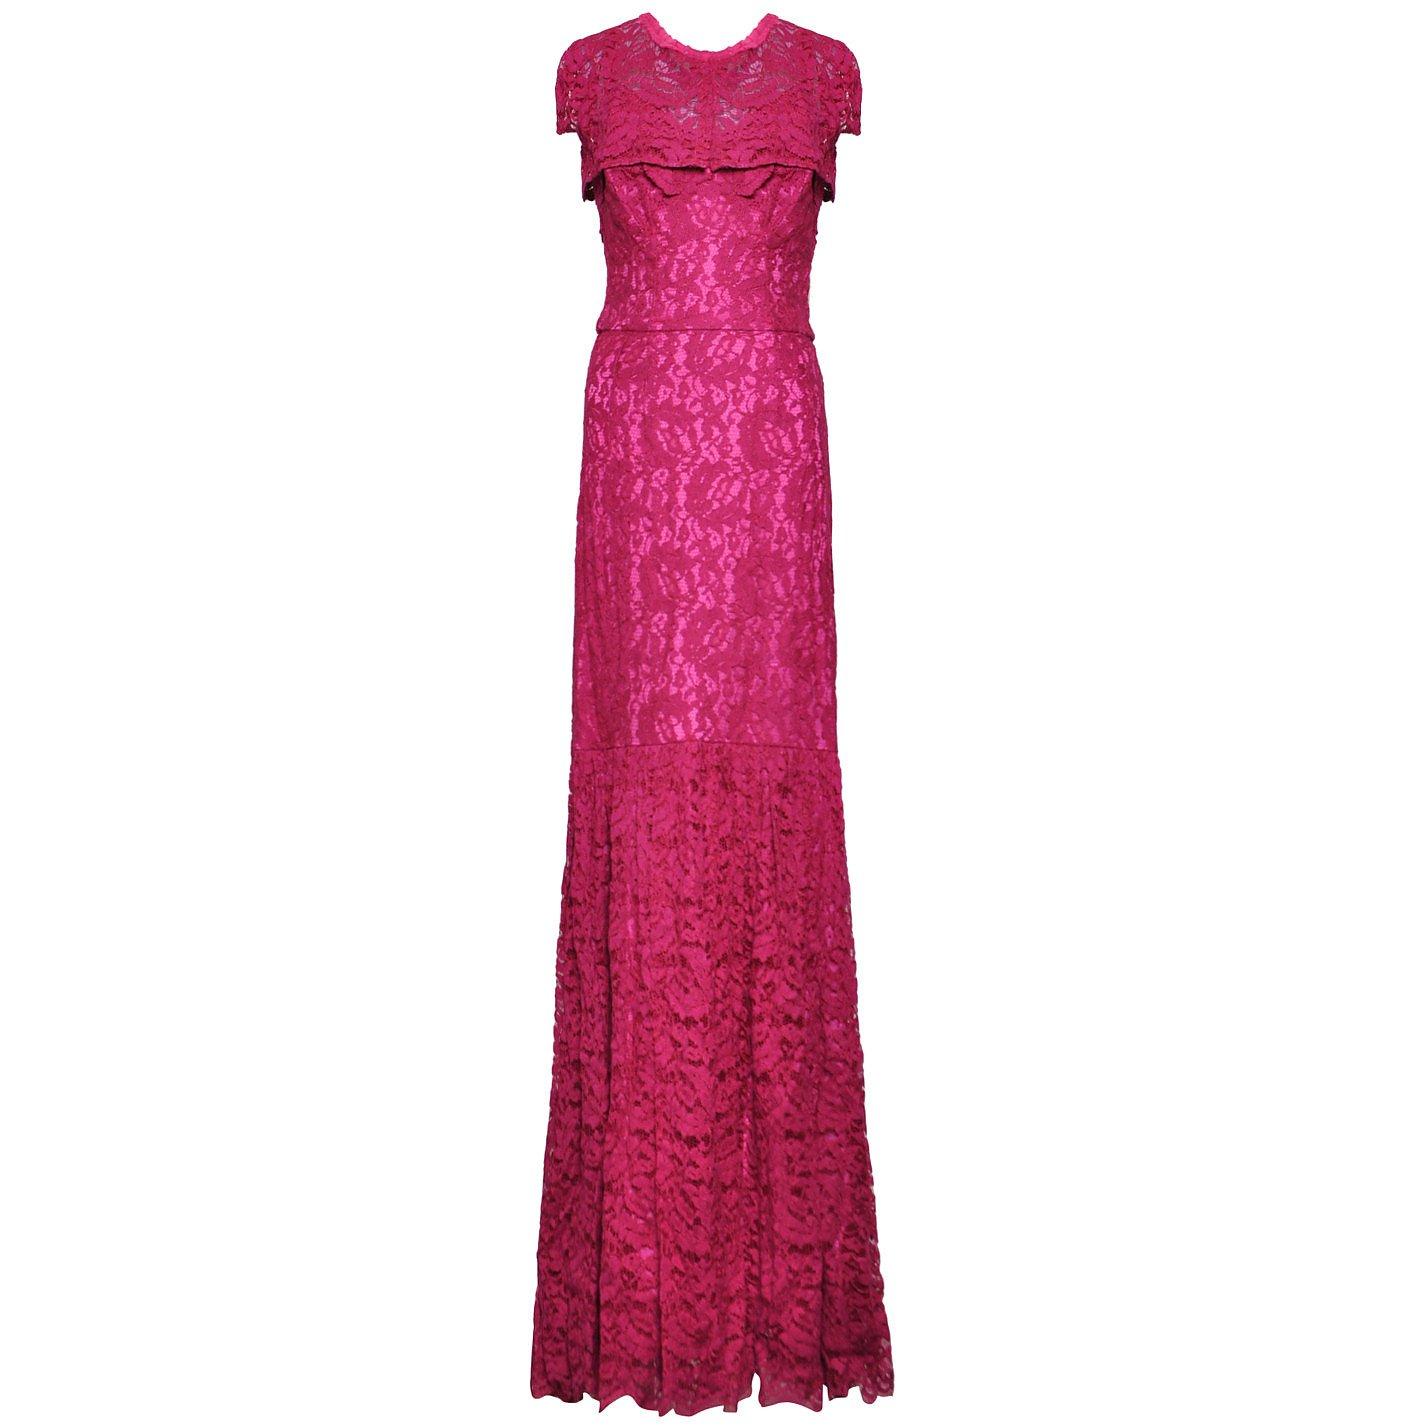 DOLCE & GABBANA Lace Dress & Shoulder Lay